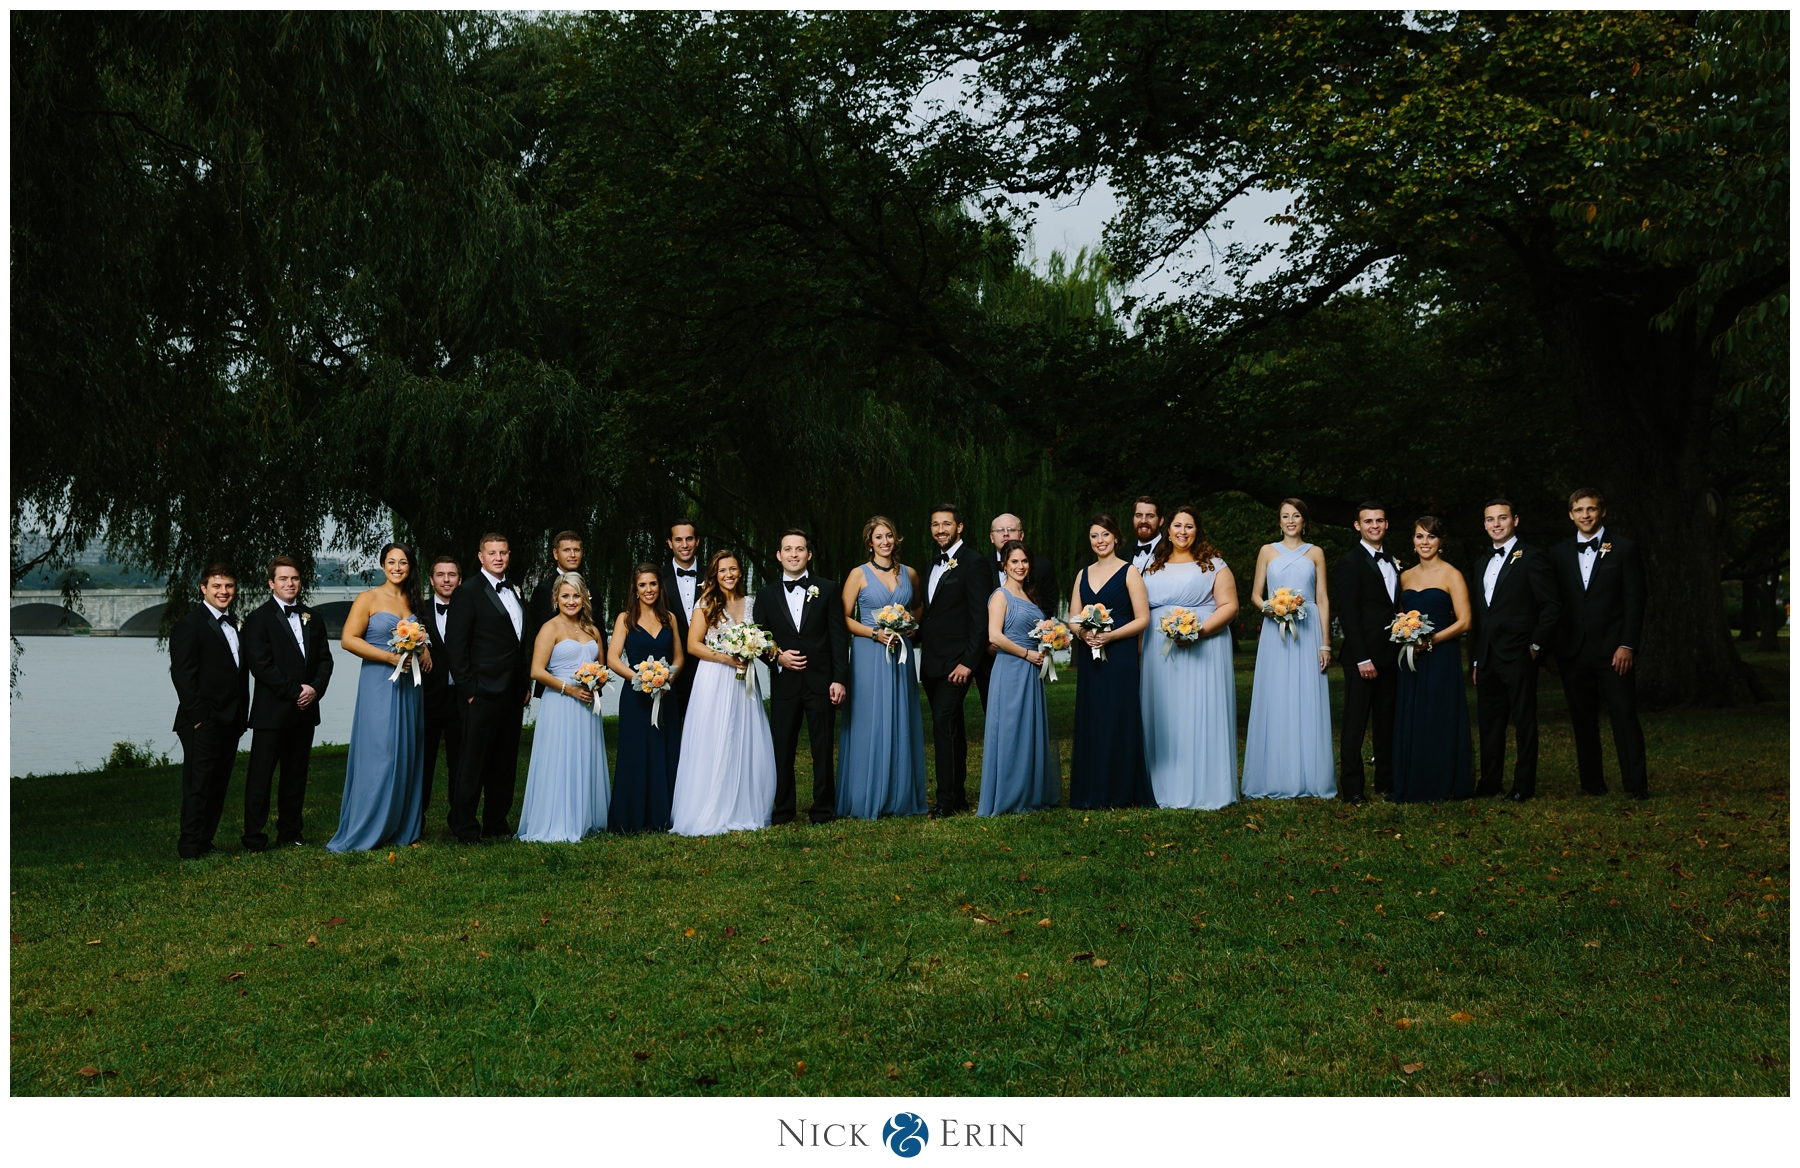 donner_photography_washington-dc-wedding_ariel-patrick_0048